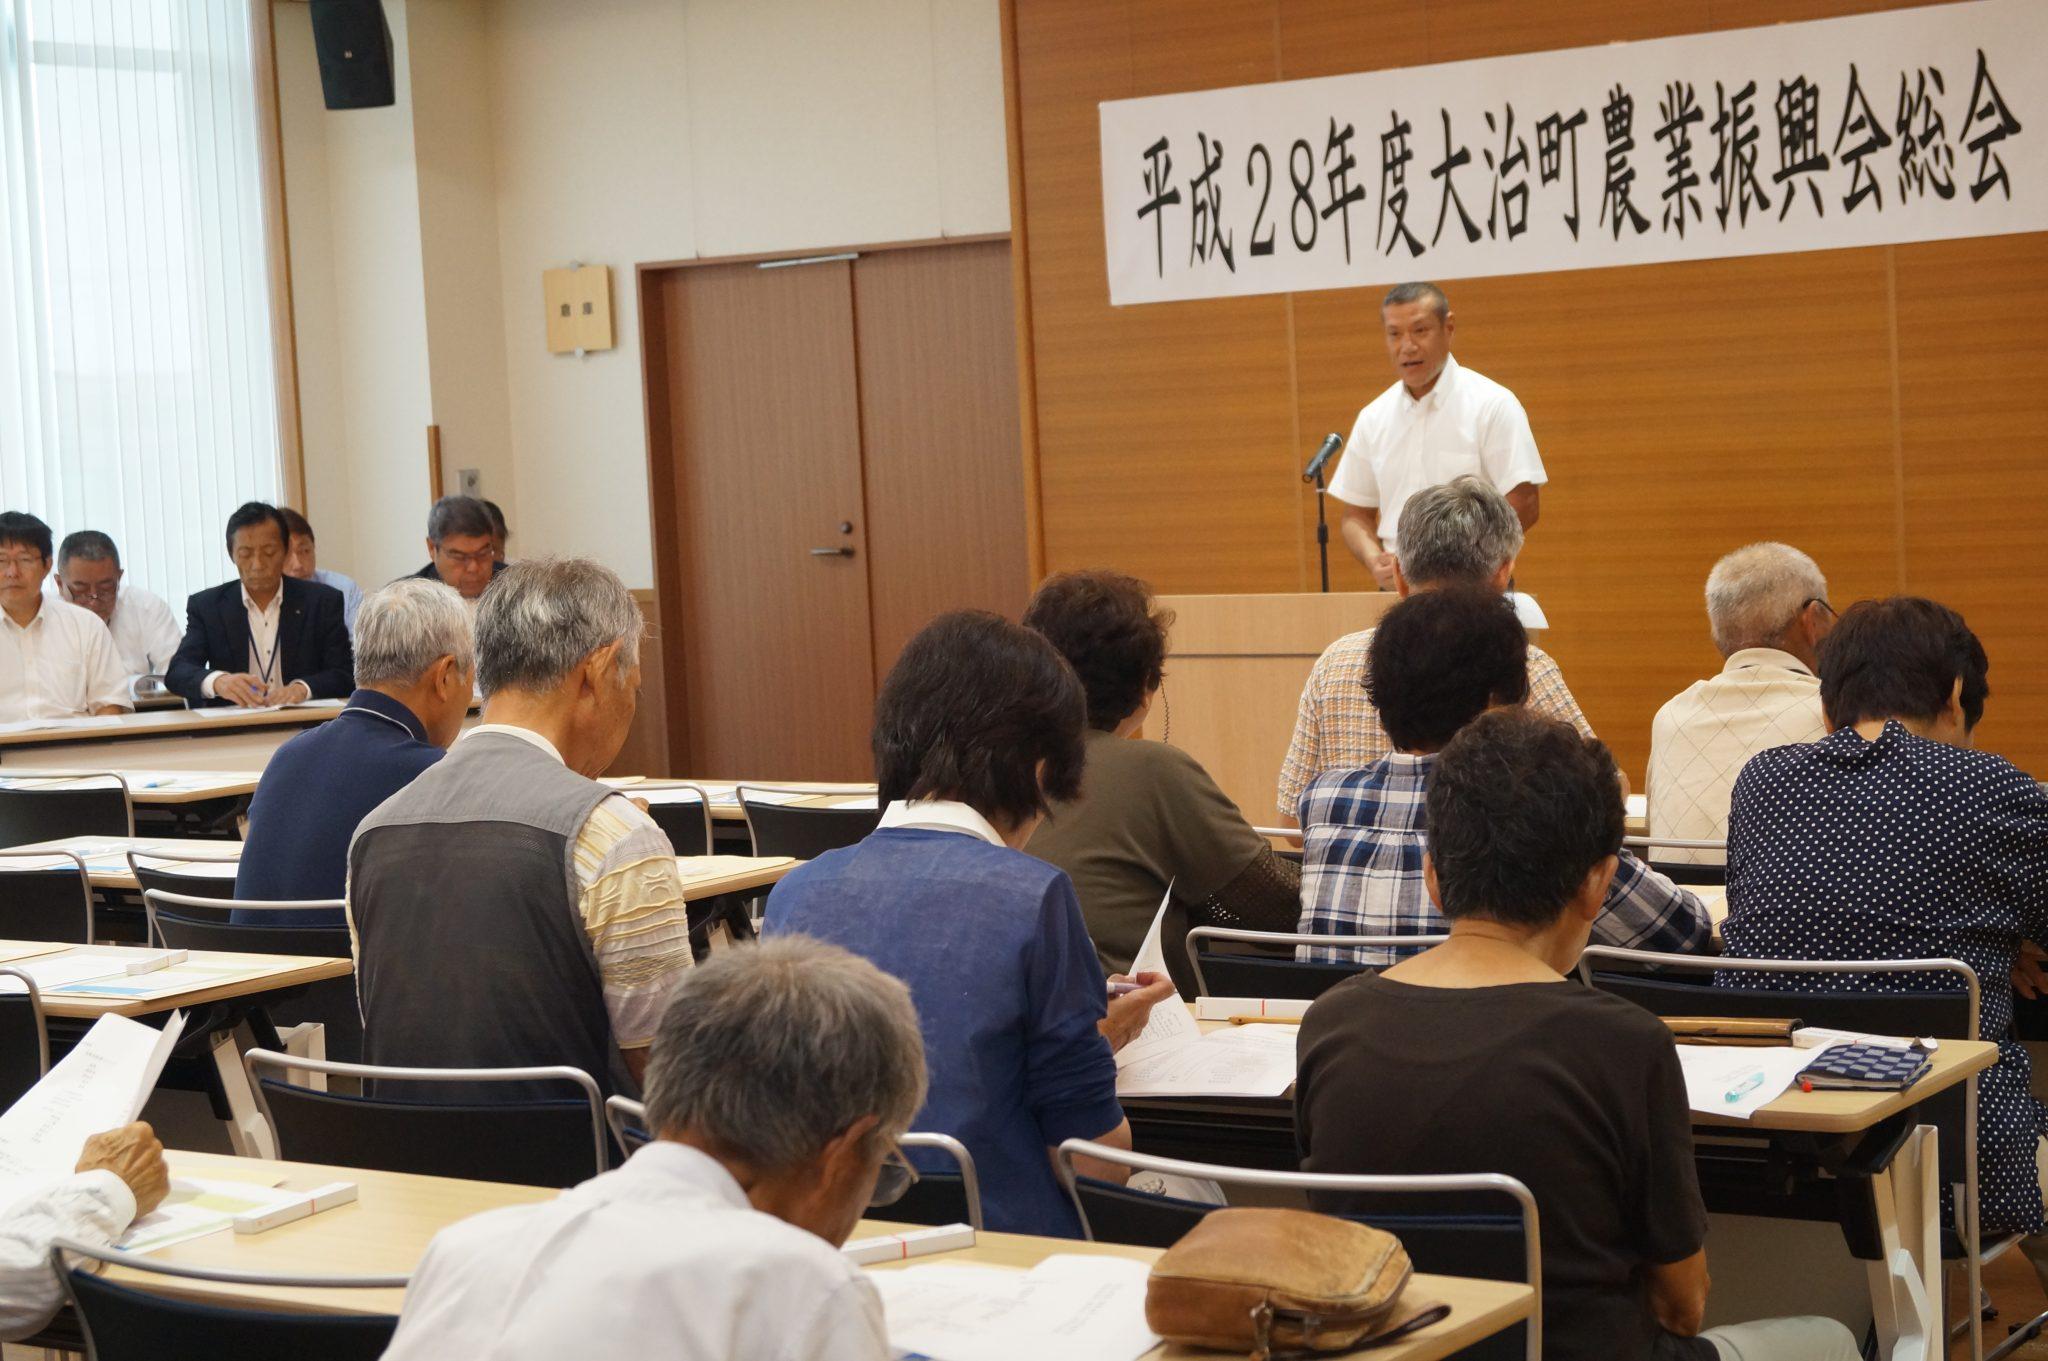 JA 海部東農業協同組合(あまひがし) -大治町農業振興会 平成28年度通常総会を開く